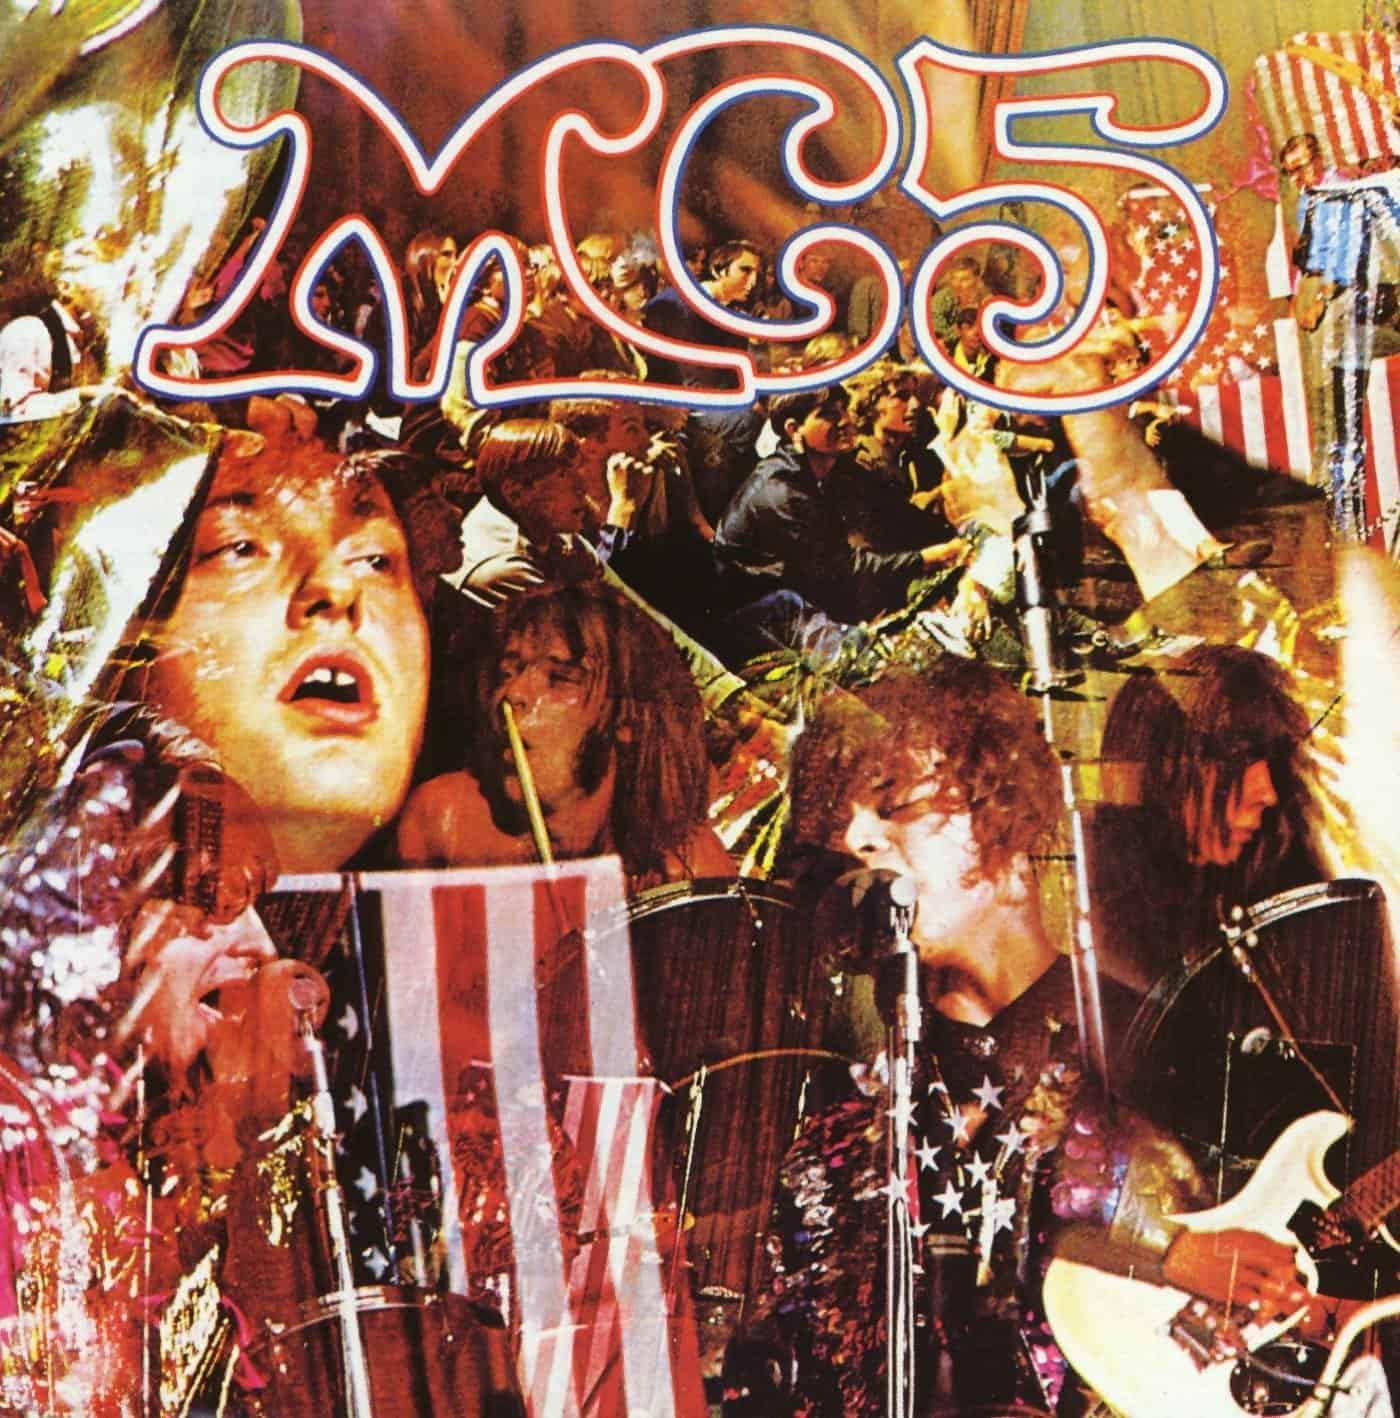 MC5 - Kick Out The Jams [LP] (Splatter vinyl)